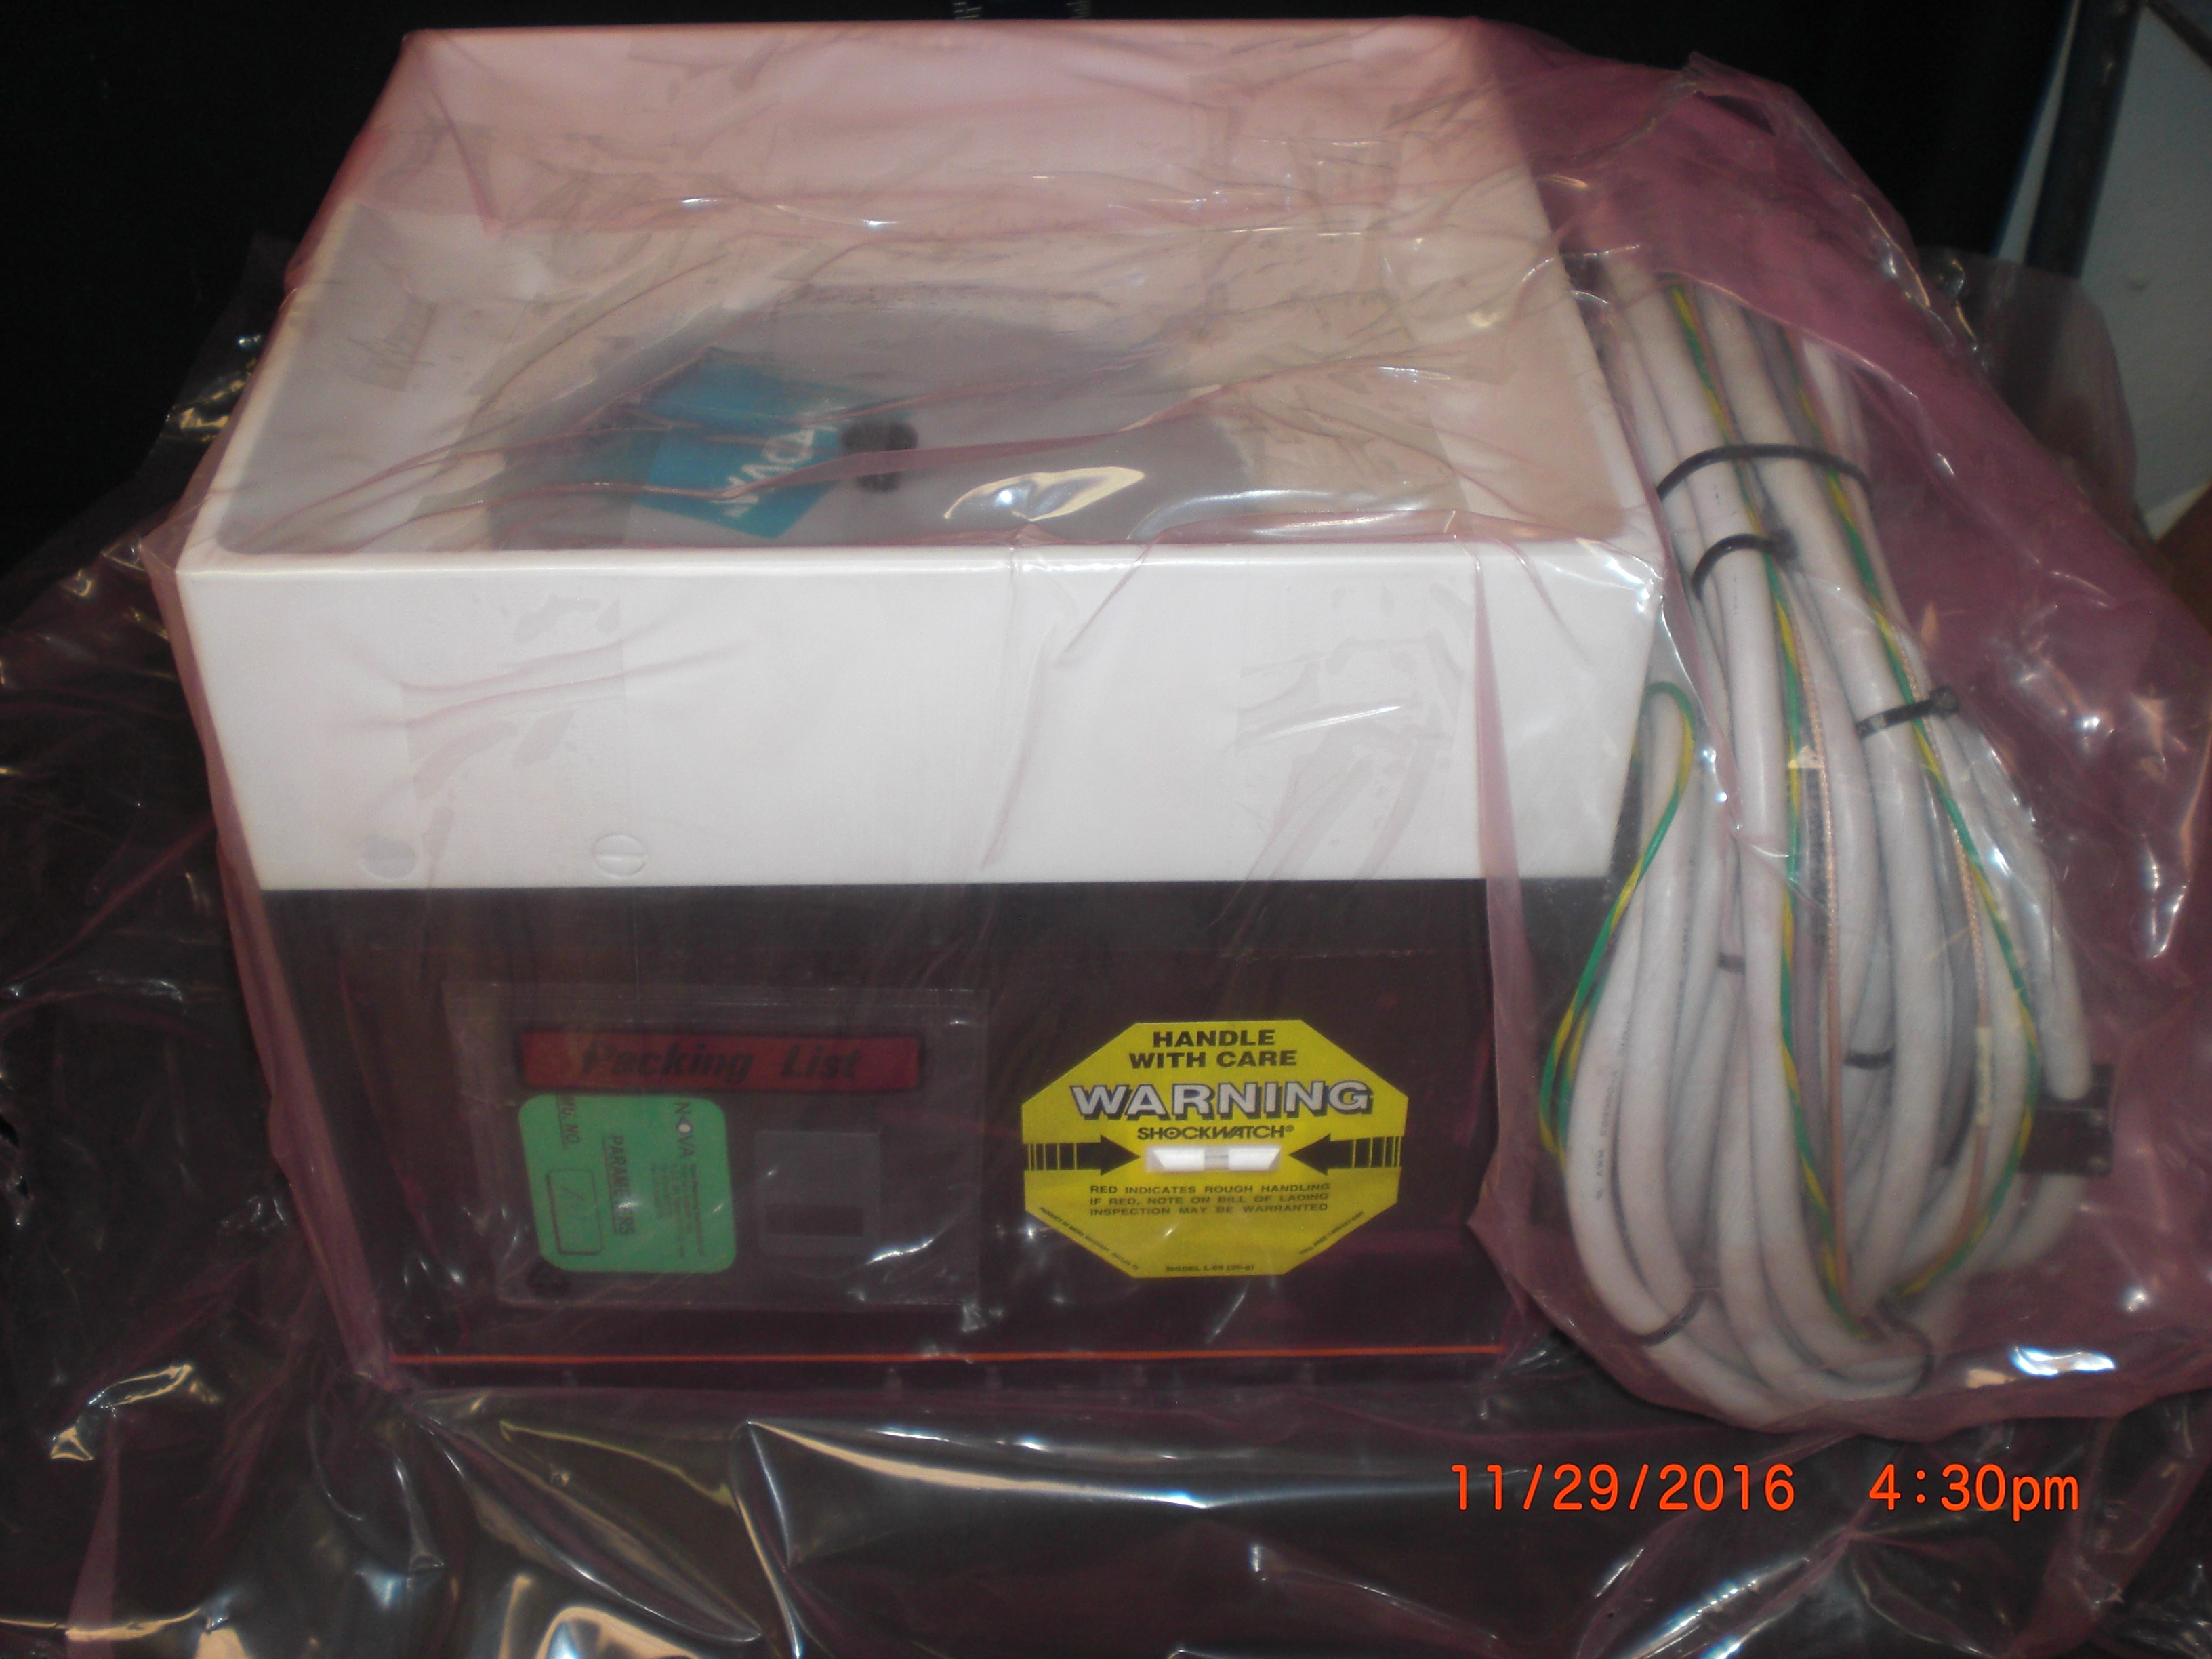 Controller NOVA 210-10000-02 Measurement Unit Novascan 420 SN842 with disc